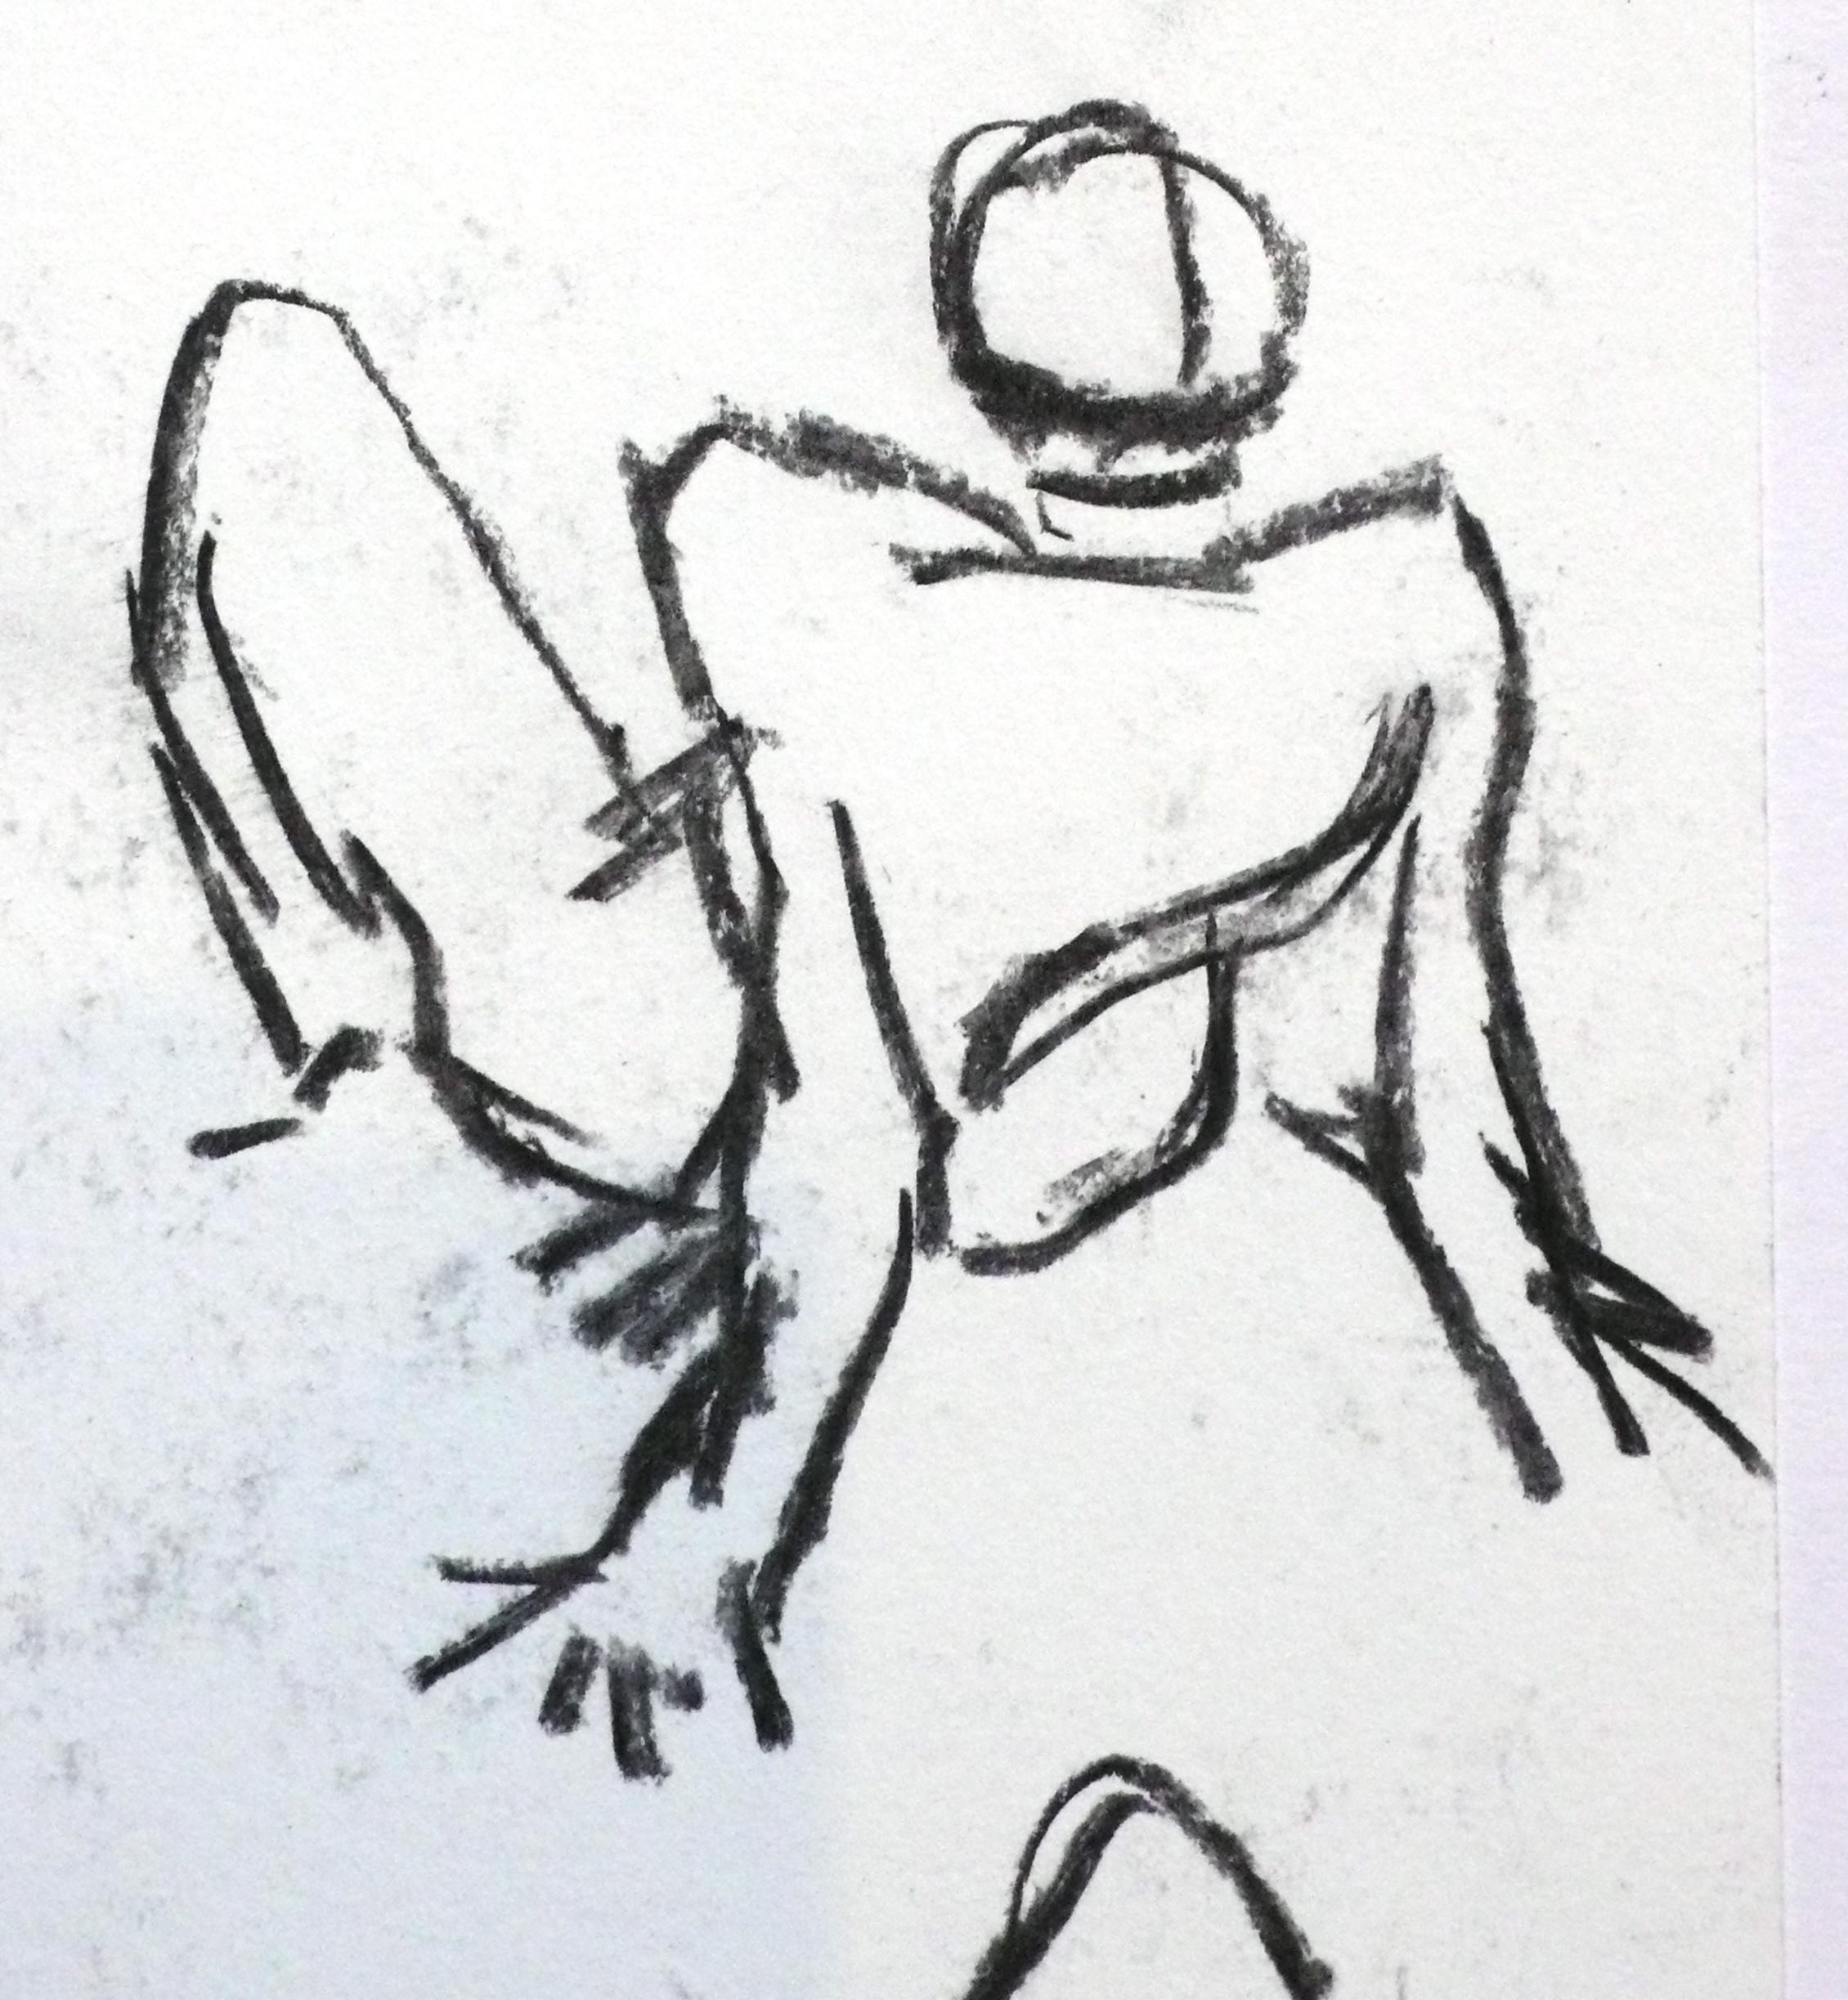 29-june-one-minute-sketch_2756765268_o.jpg